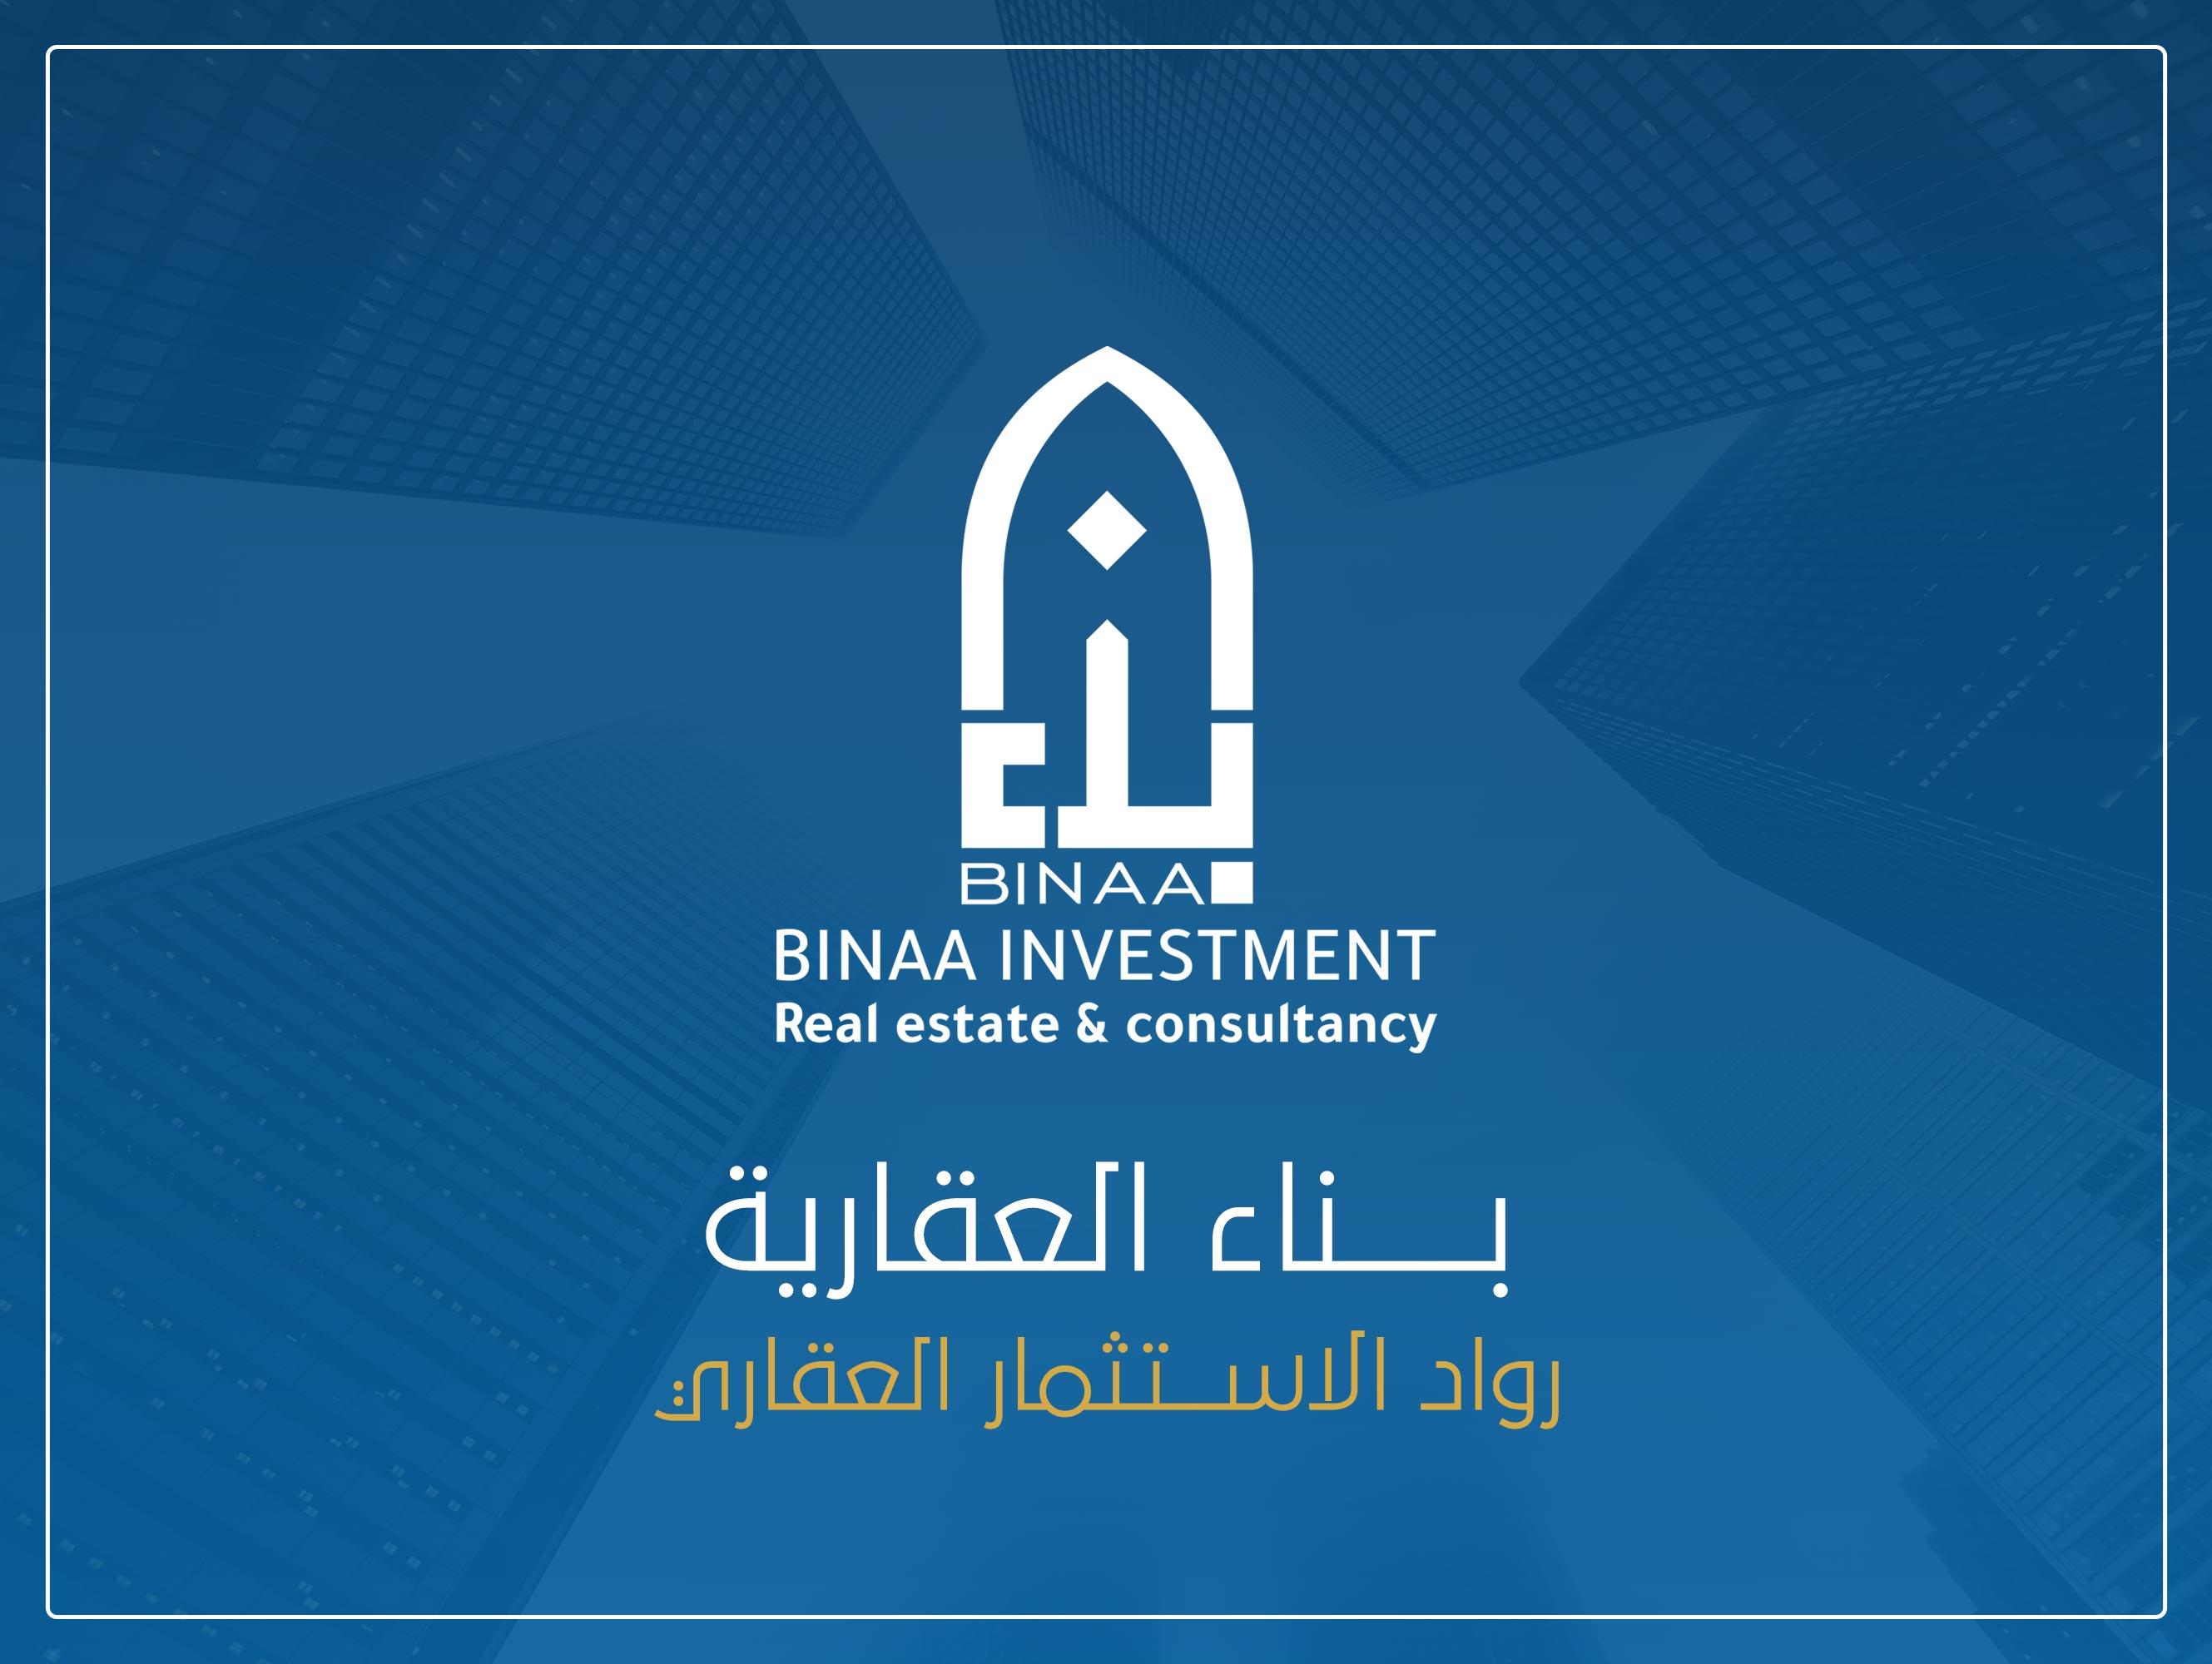 Binaa Investment Company